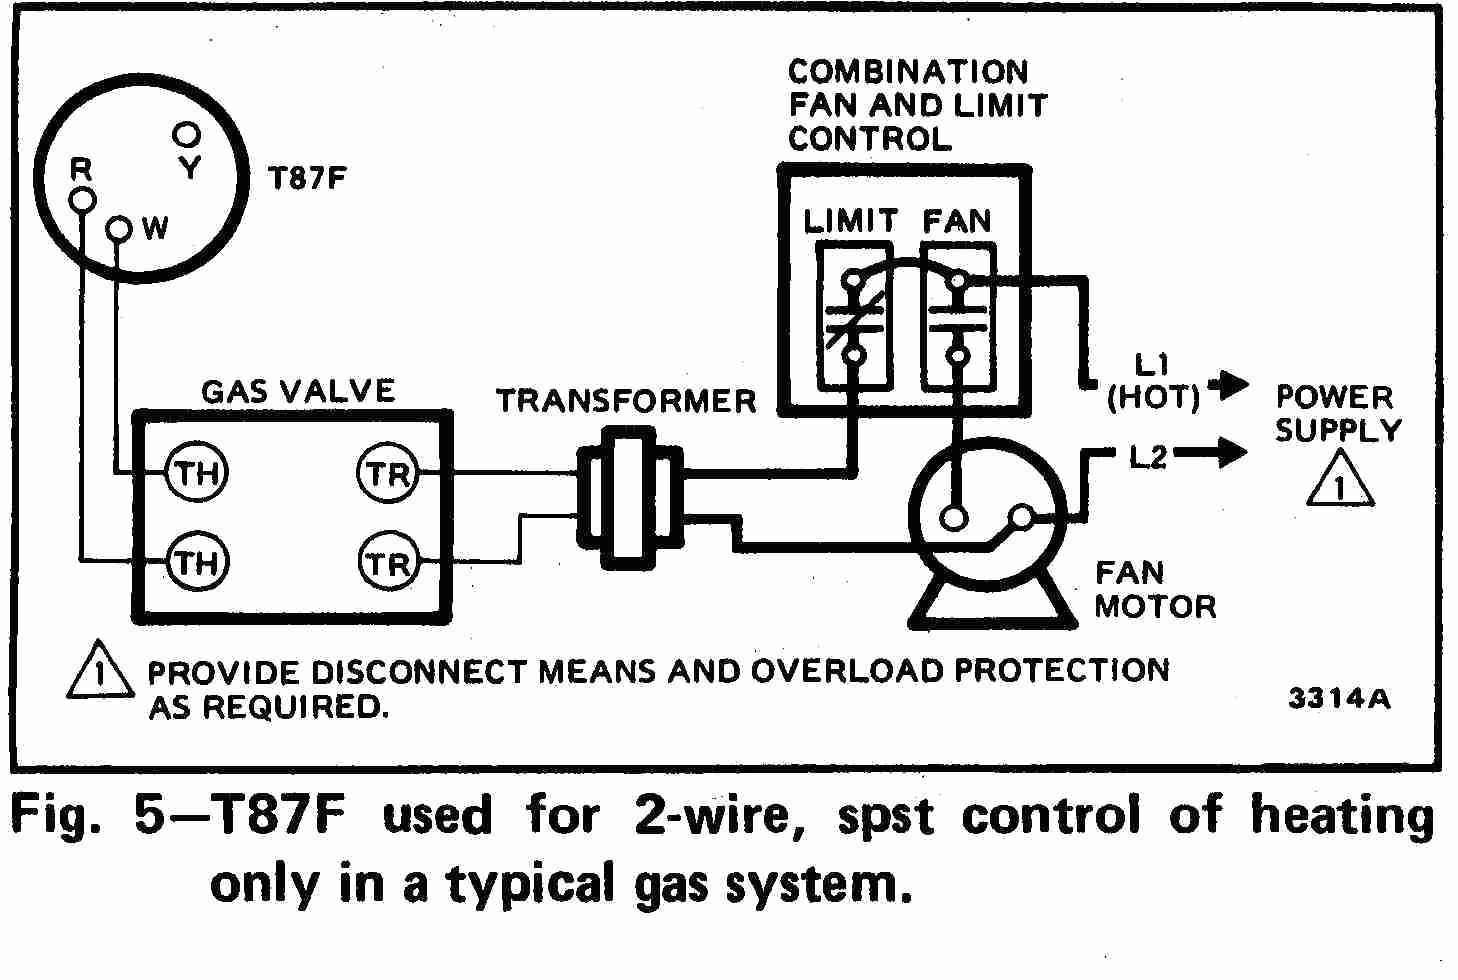 honeywell gas valve wiring diagram wiring diagram image old gas furnace wiring  diagram honeywell gas valve wiring diagram